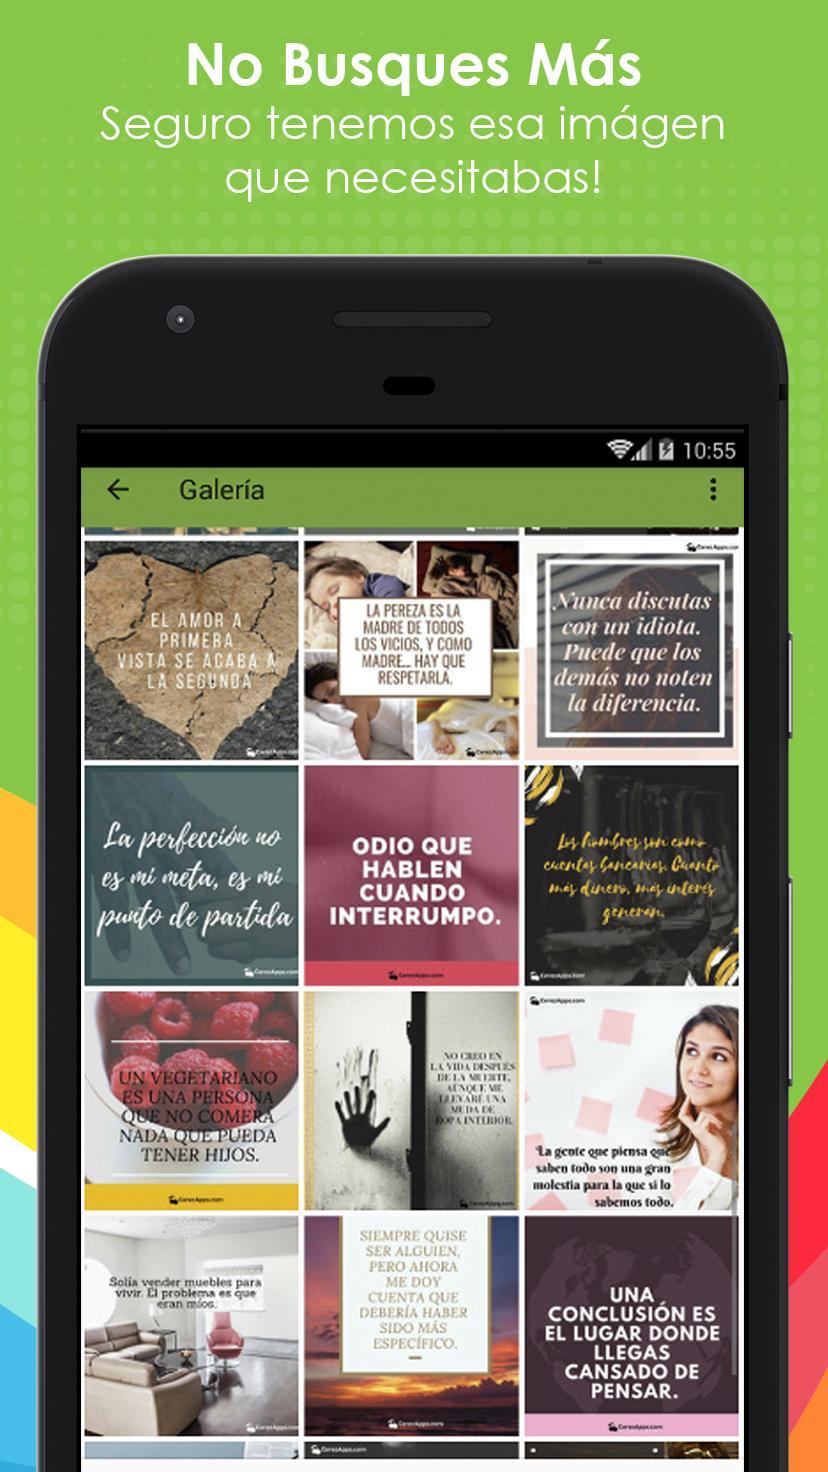 Frases Graciosas Con Imágenes For Android Apk Download